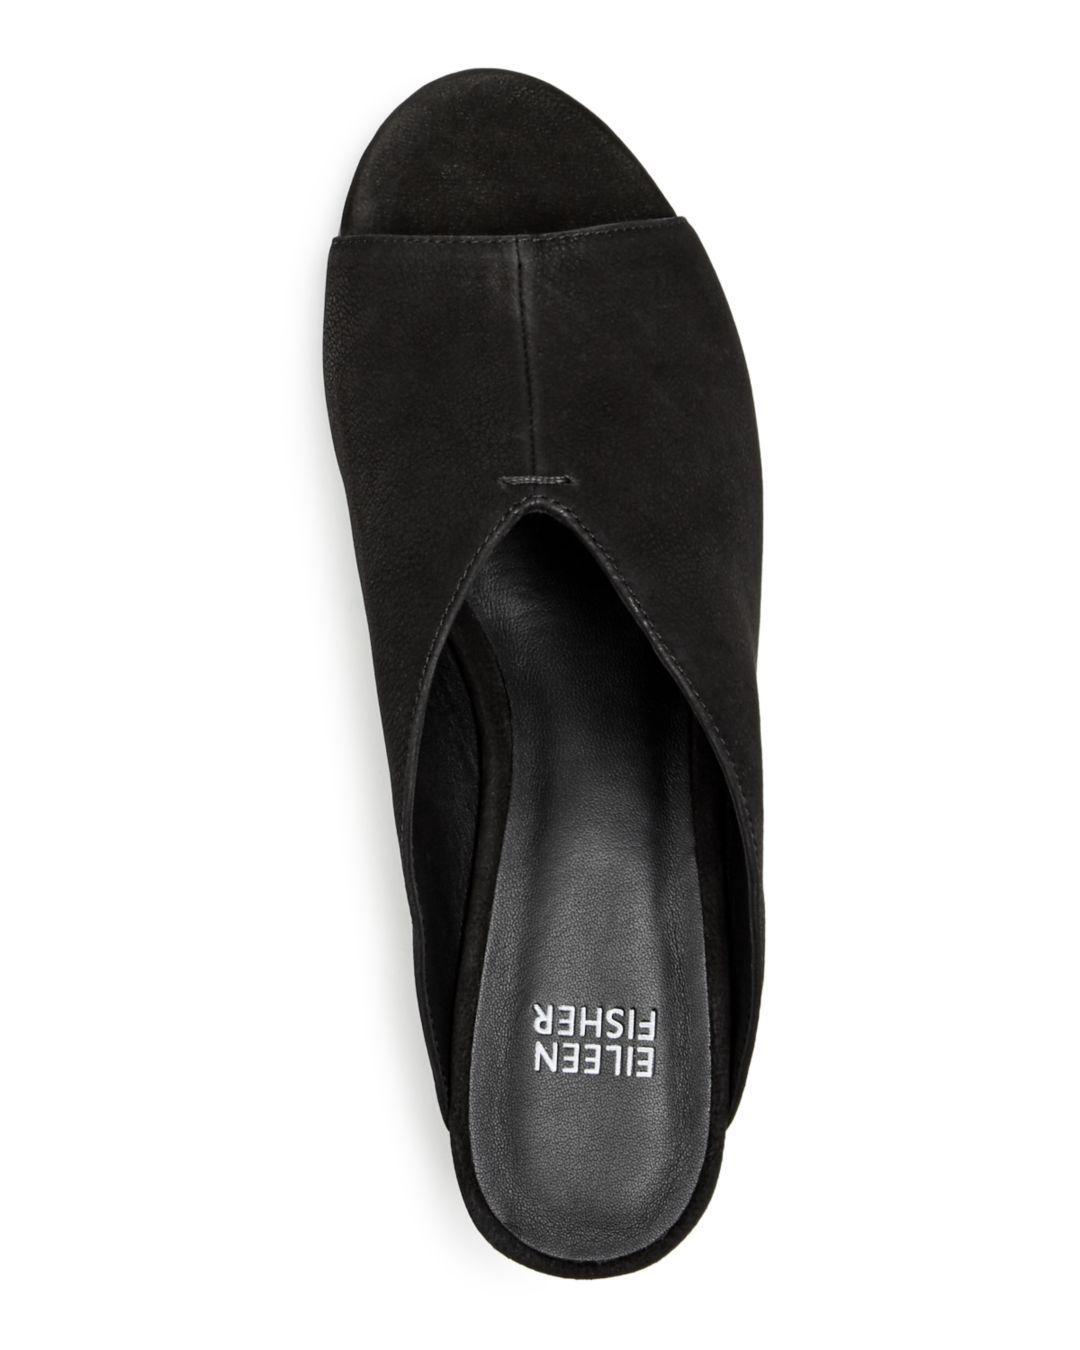 73d85df45acd Lyst - Eileen Fisher Women s Katniss Nubuck Leather Block Heel Slide ...